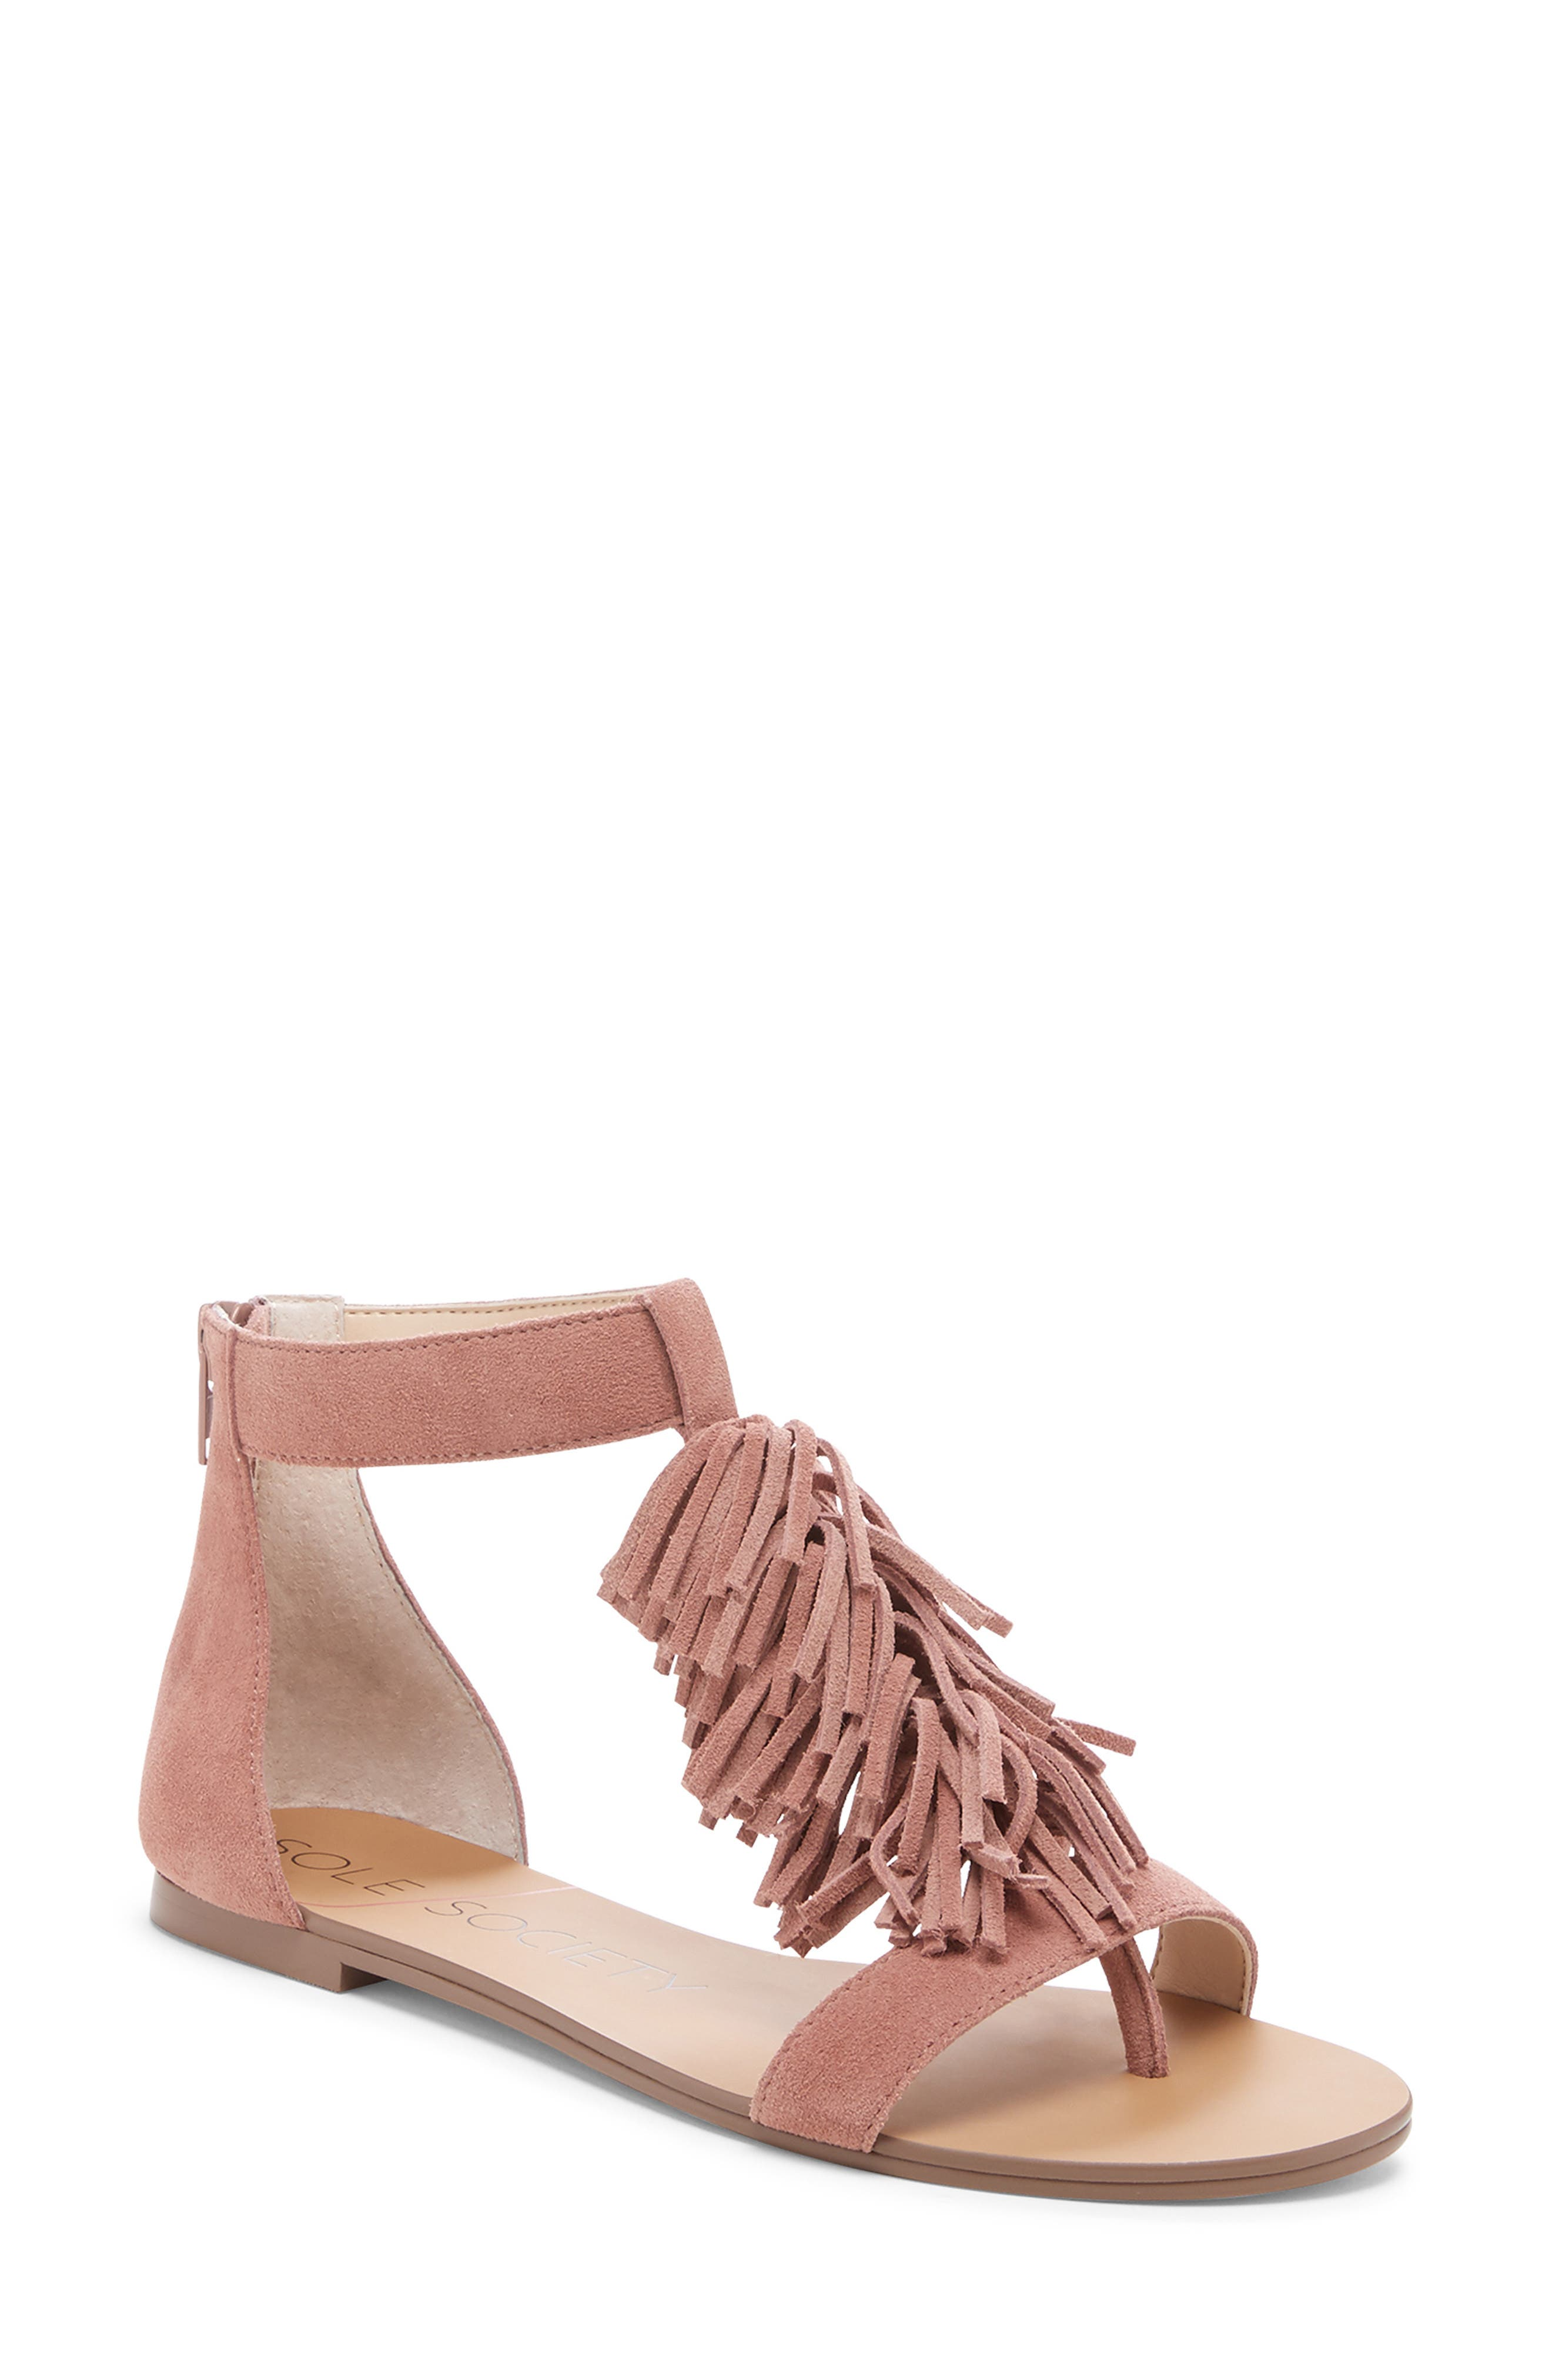 SOLE SOCIETY, 'Koa' Fringe T-Strap Flat Sandal, Main thumbnail 1, color, MOD MAUVE SUEDE